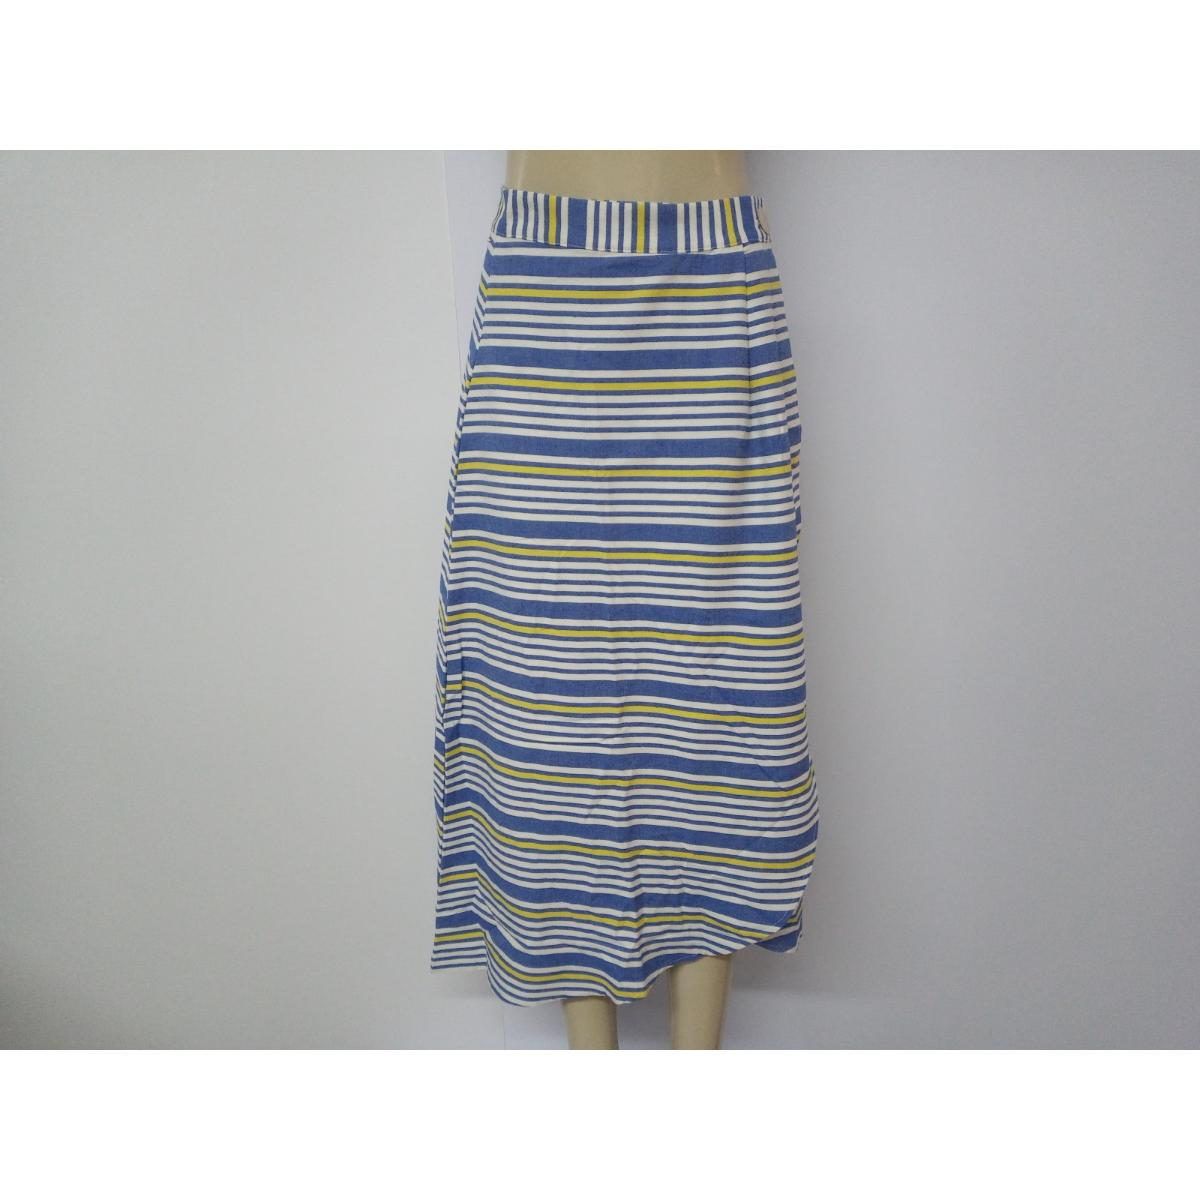 Saia Feminina Colcci 80103432 Vc549 Azul/amarelo Estampado